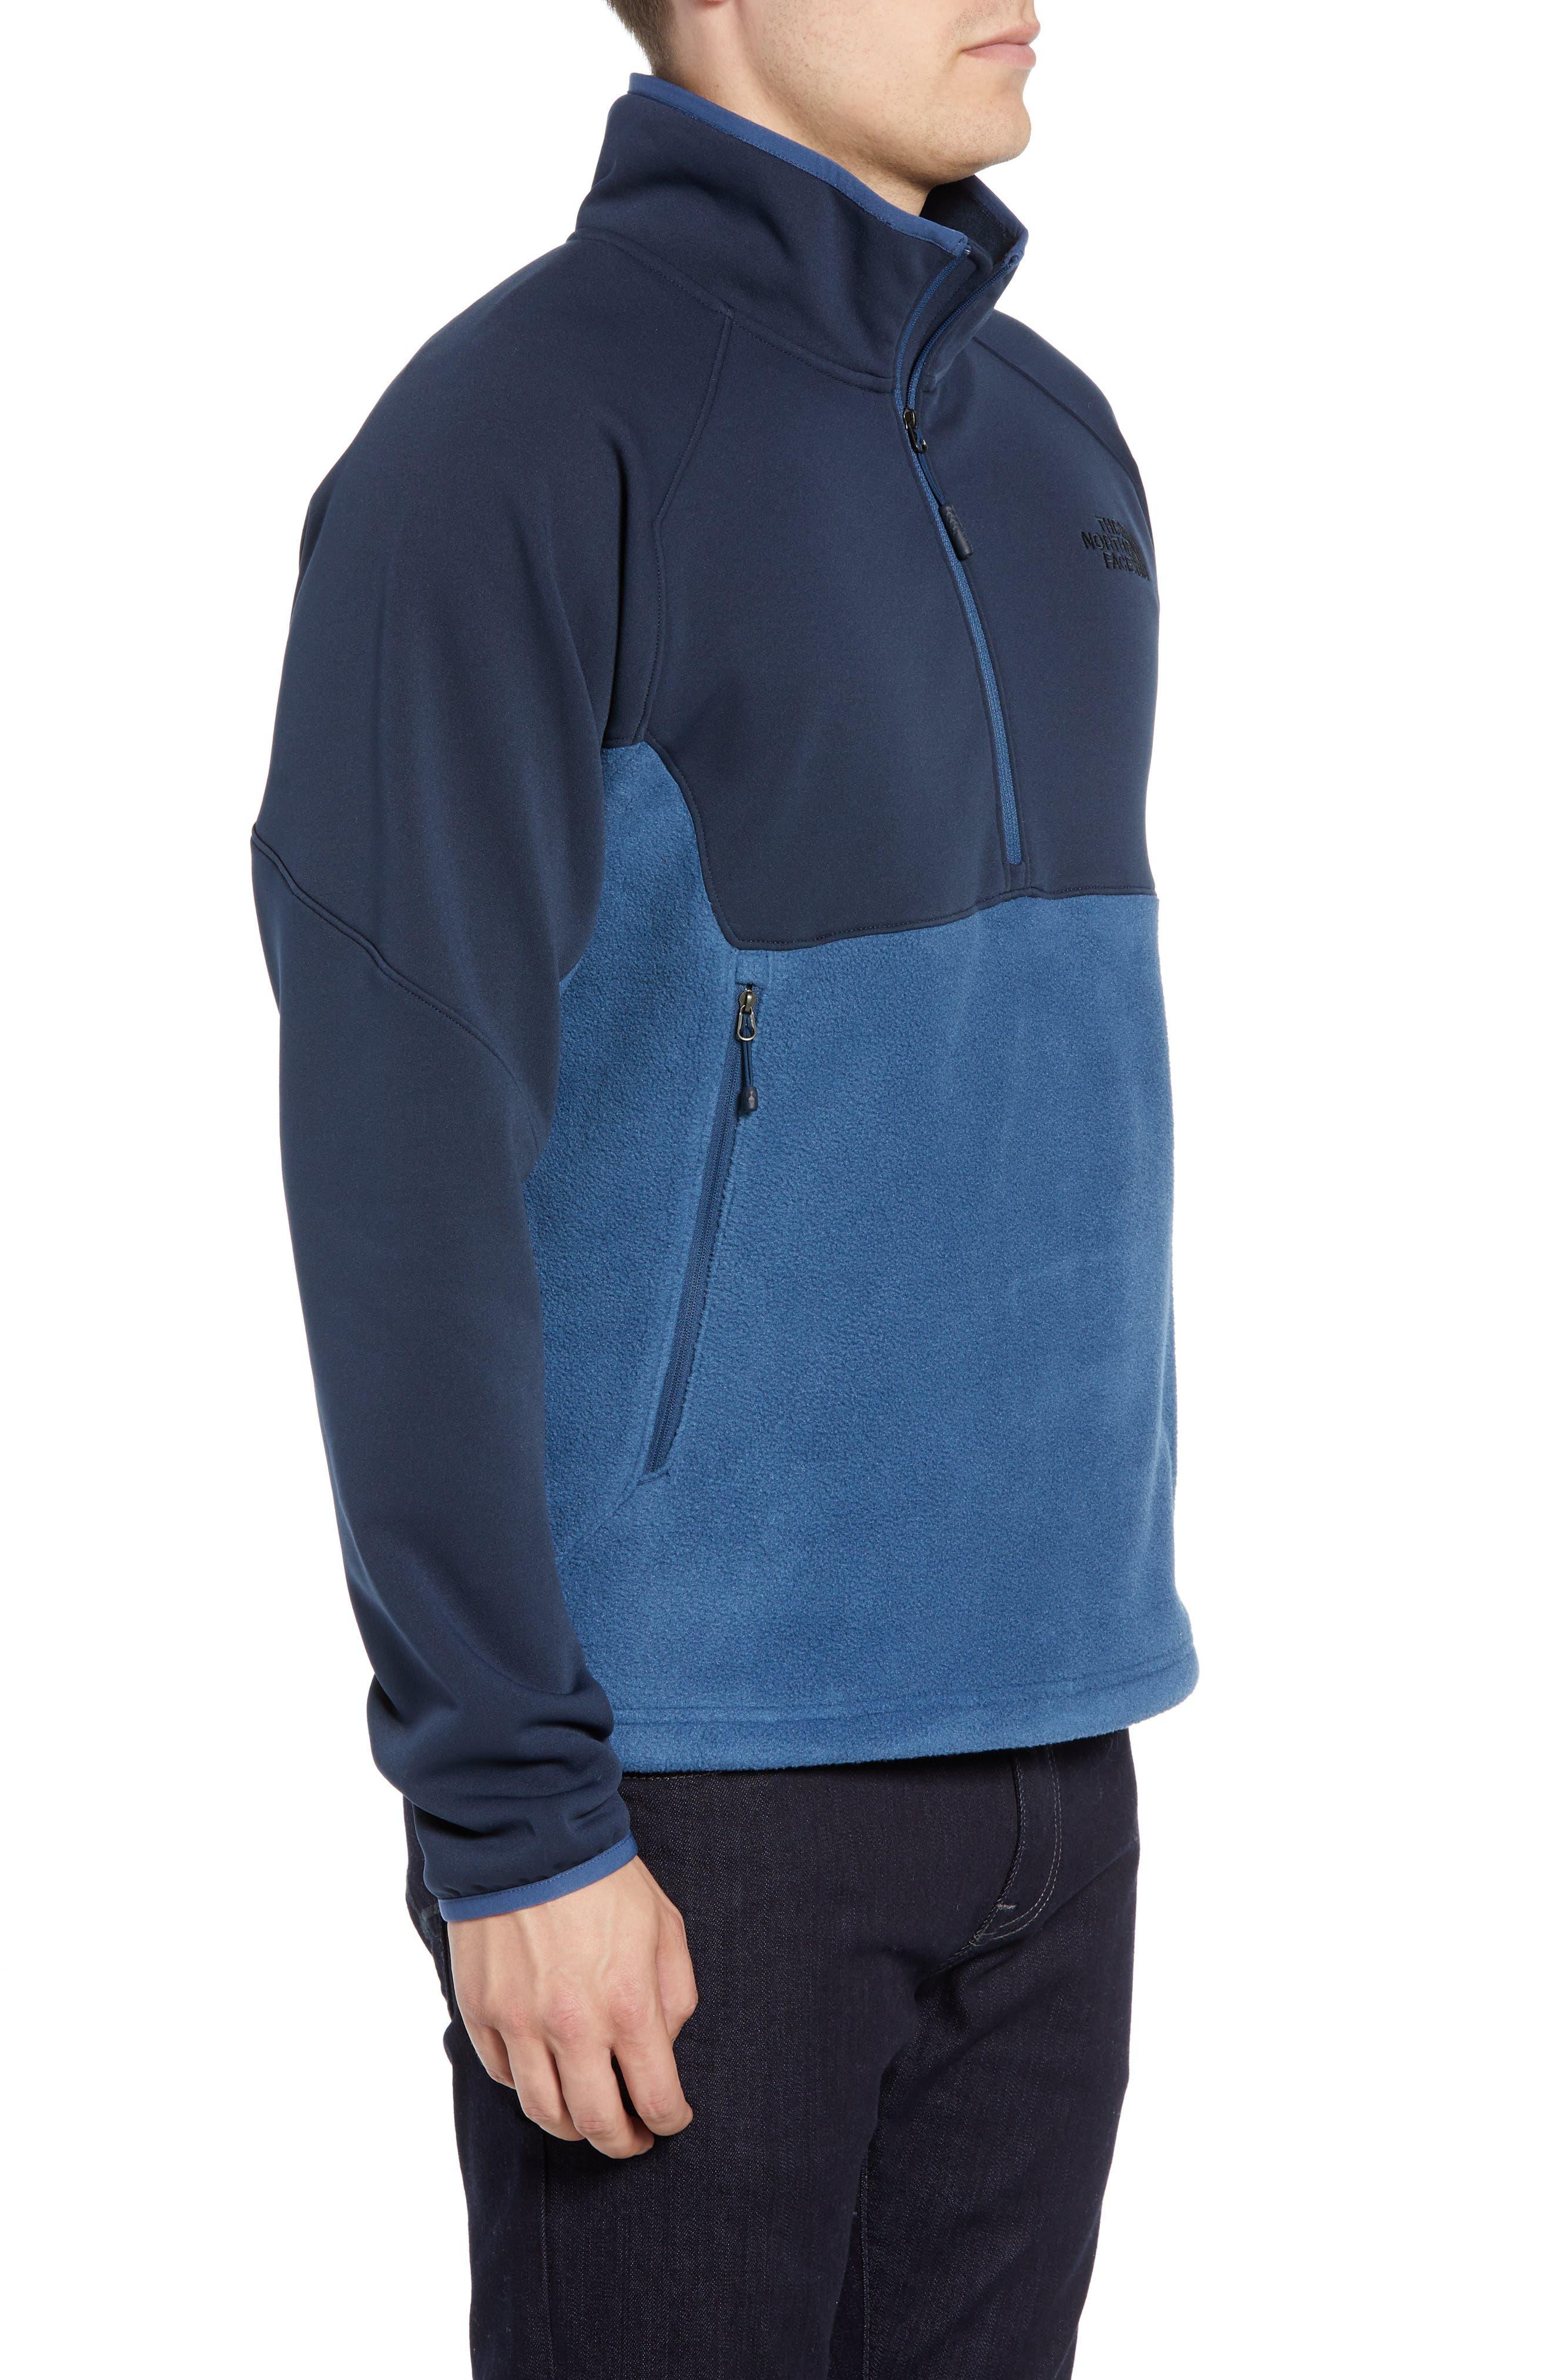 Tolmiepeak Hybrid Half-Zip Pullover,                             Alternate thumbnail 3, color,                             SHADY BLUE/ URBAN NAVY